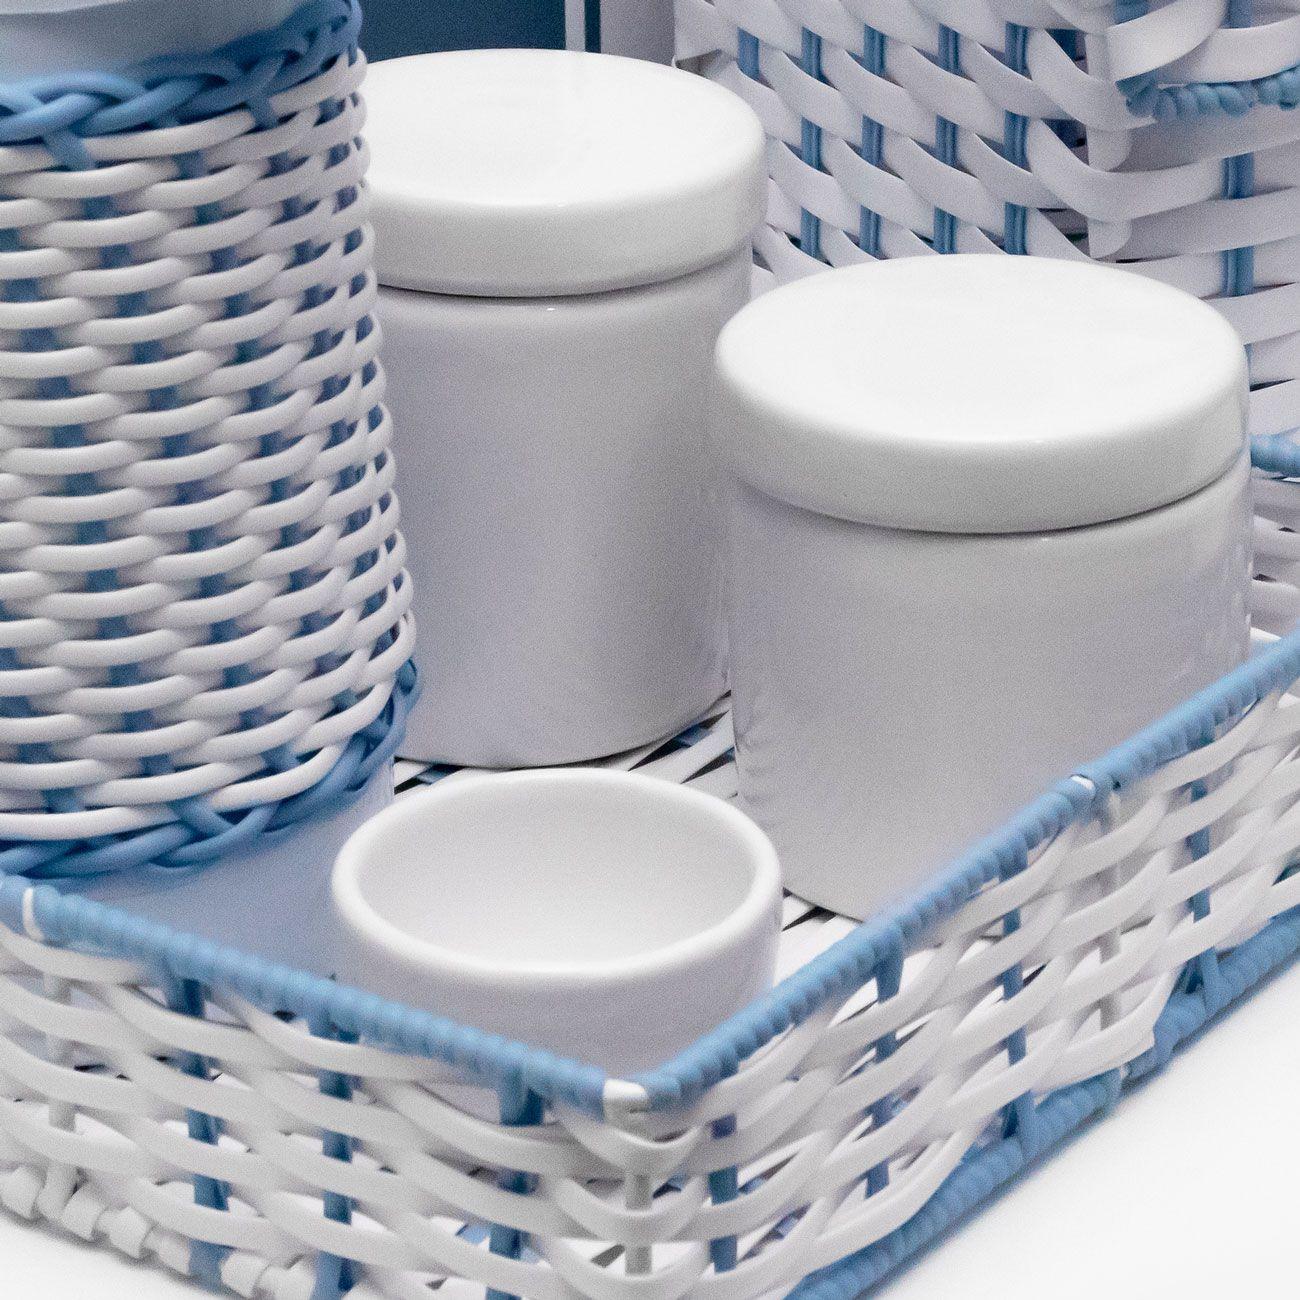 Kit Higiene 6 Peças Bebê Cerâmica, Ferro e Vime Sintético Branco e Azul